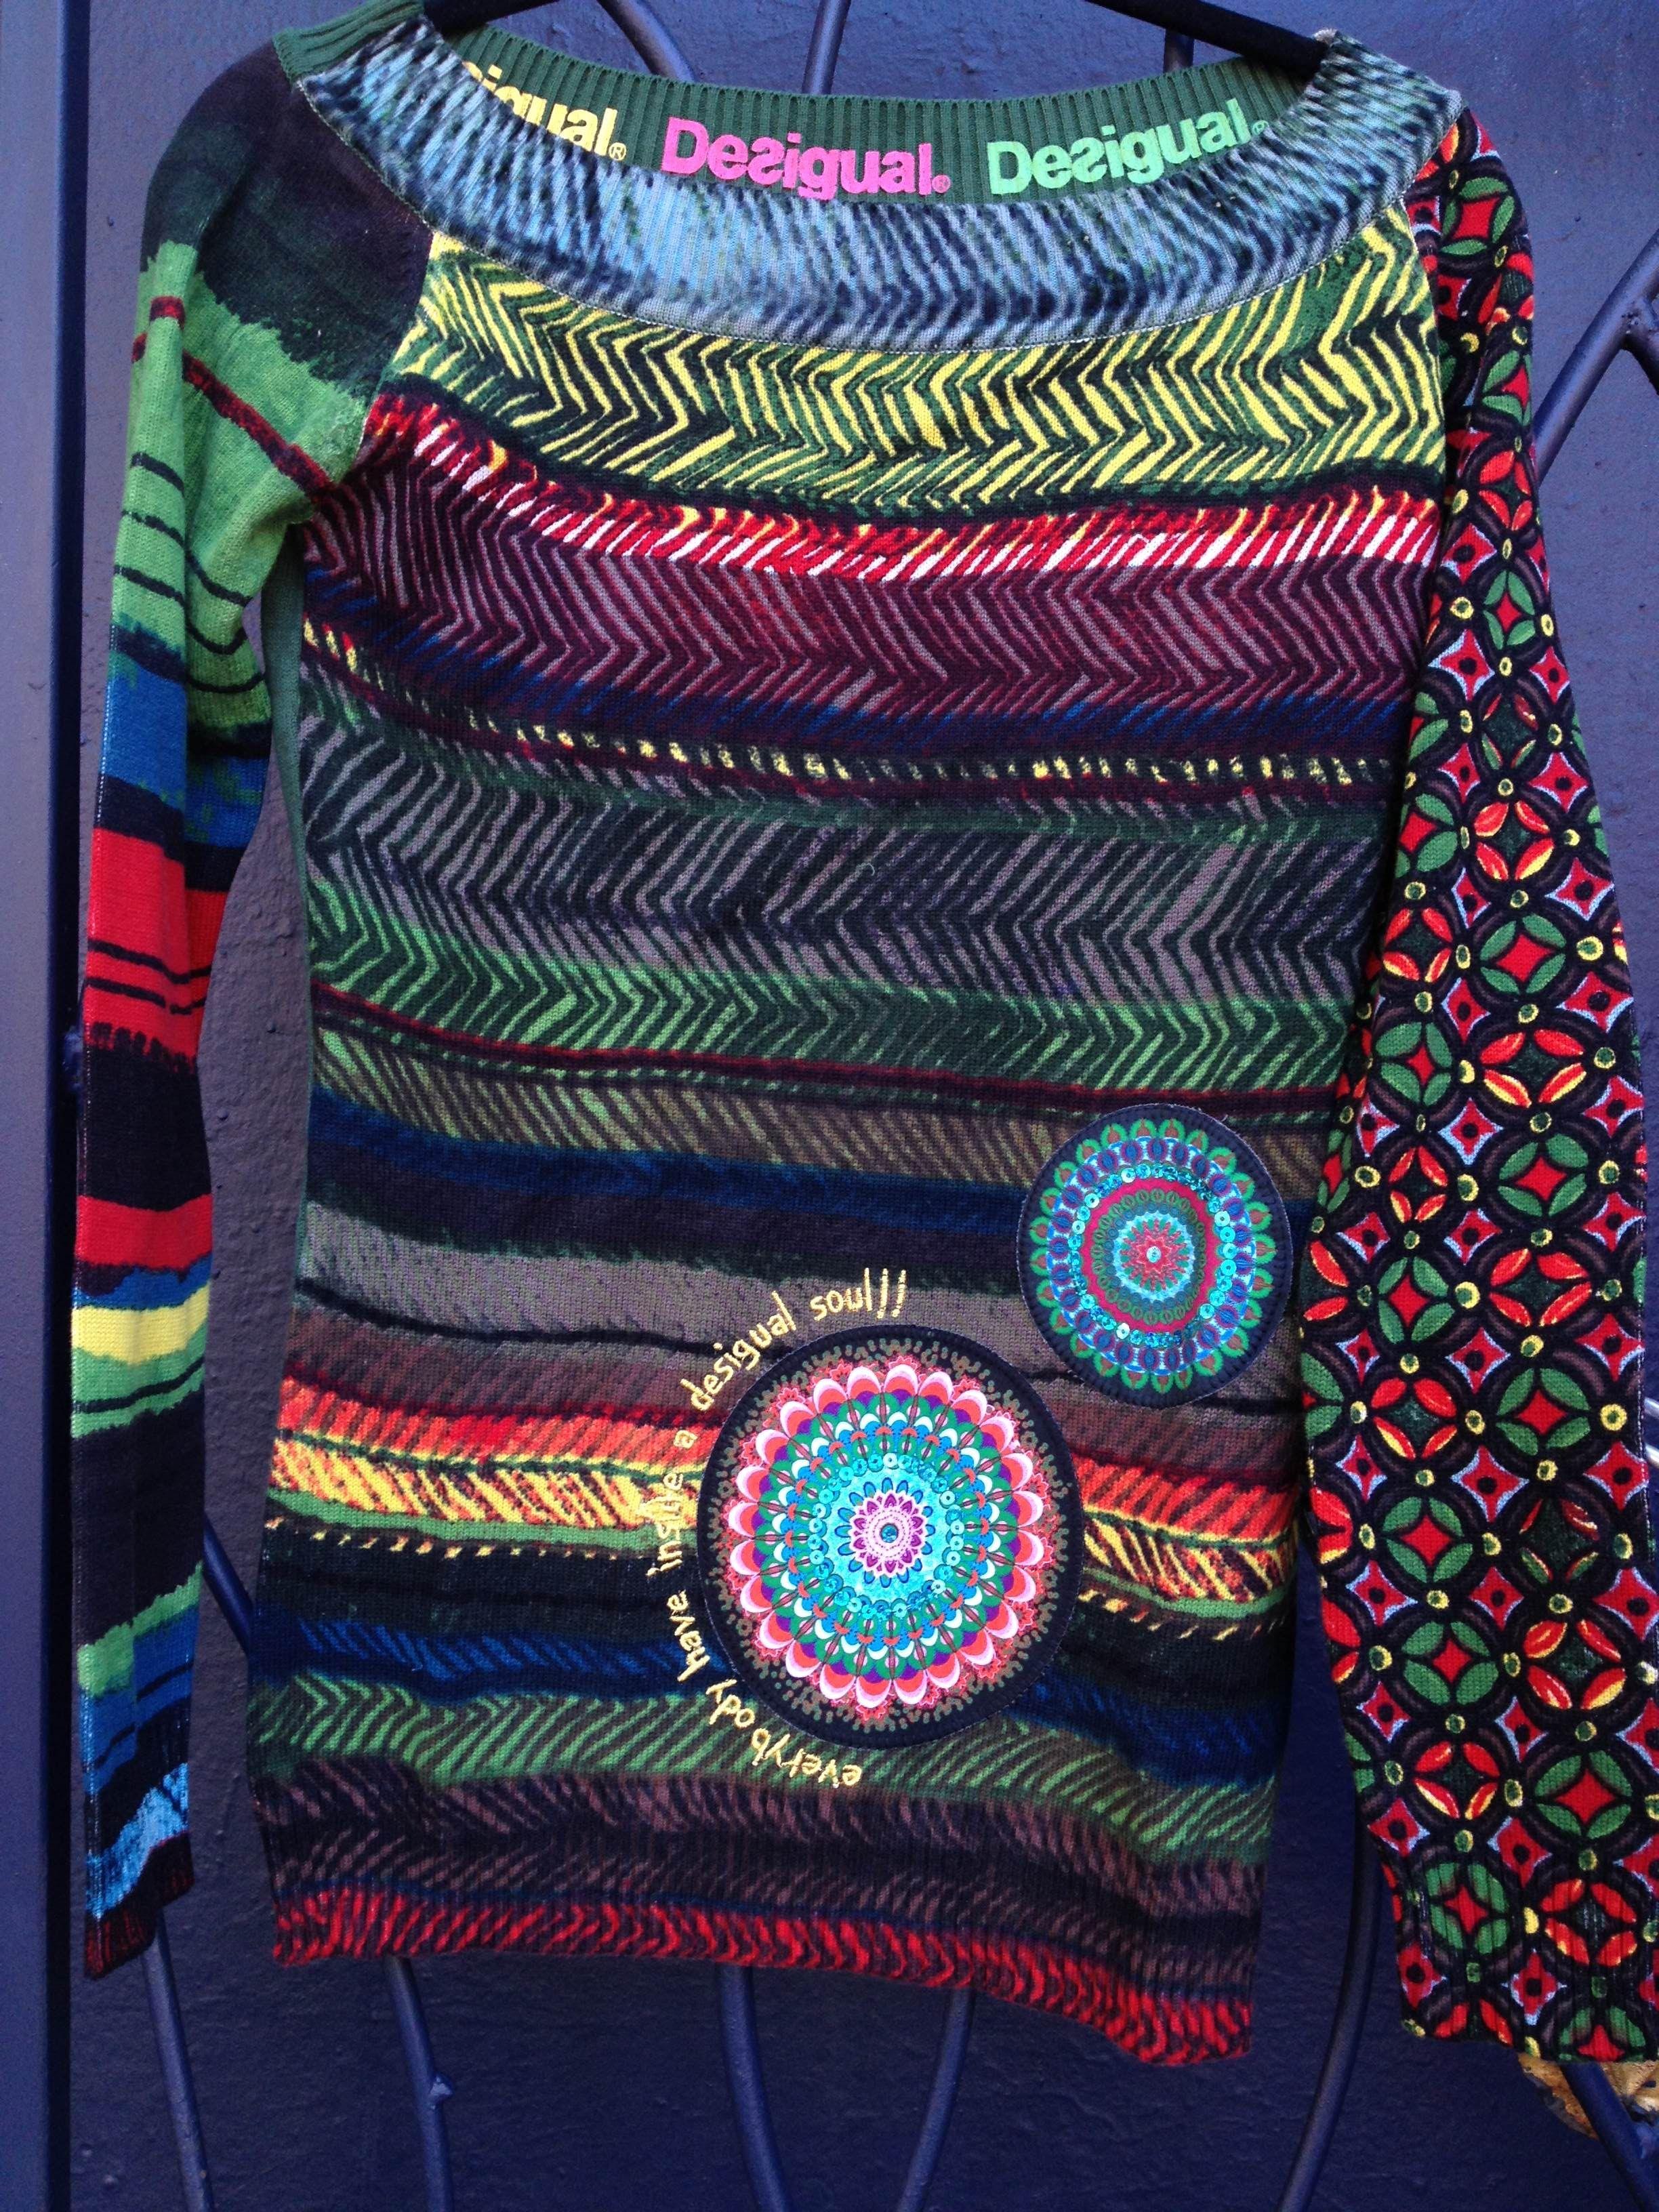 Desigual Morries - Love this sweater Handarbeiten 5f89d7329d9